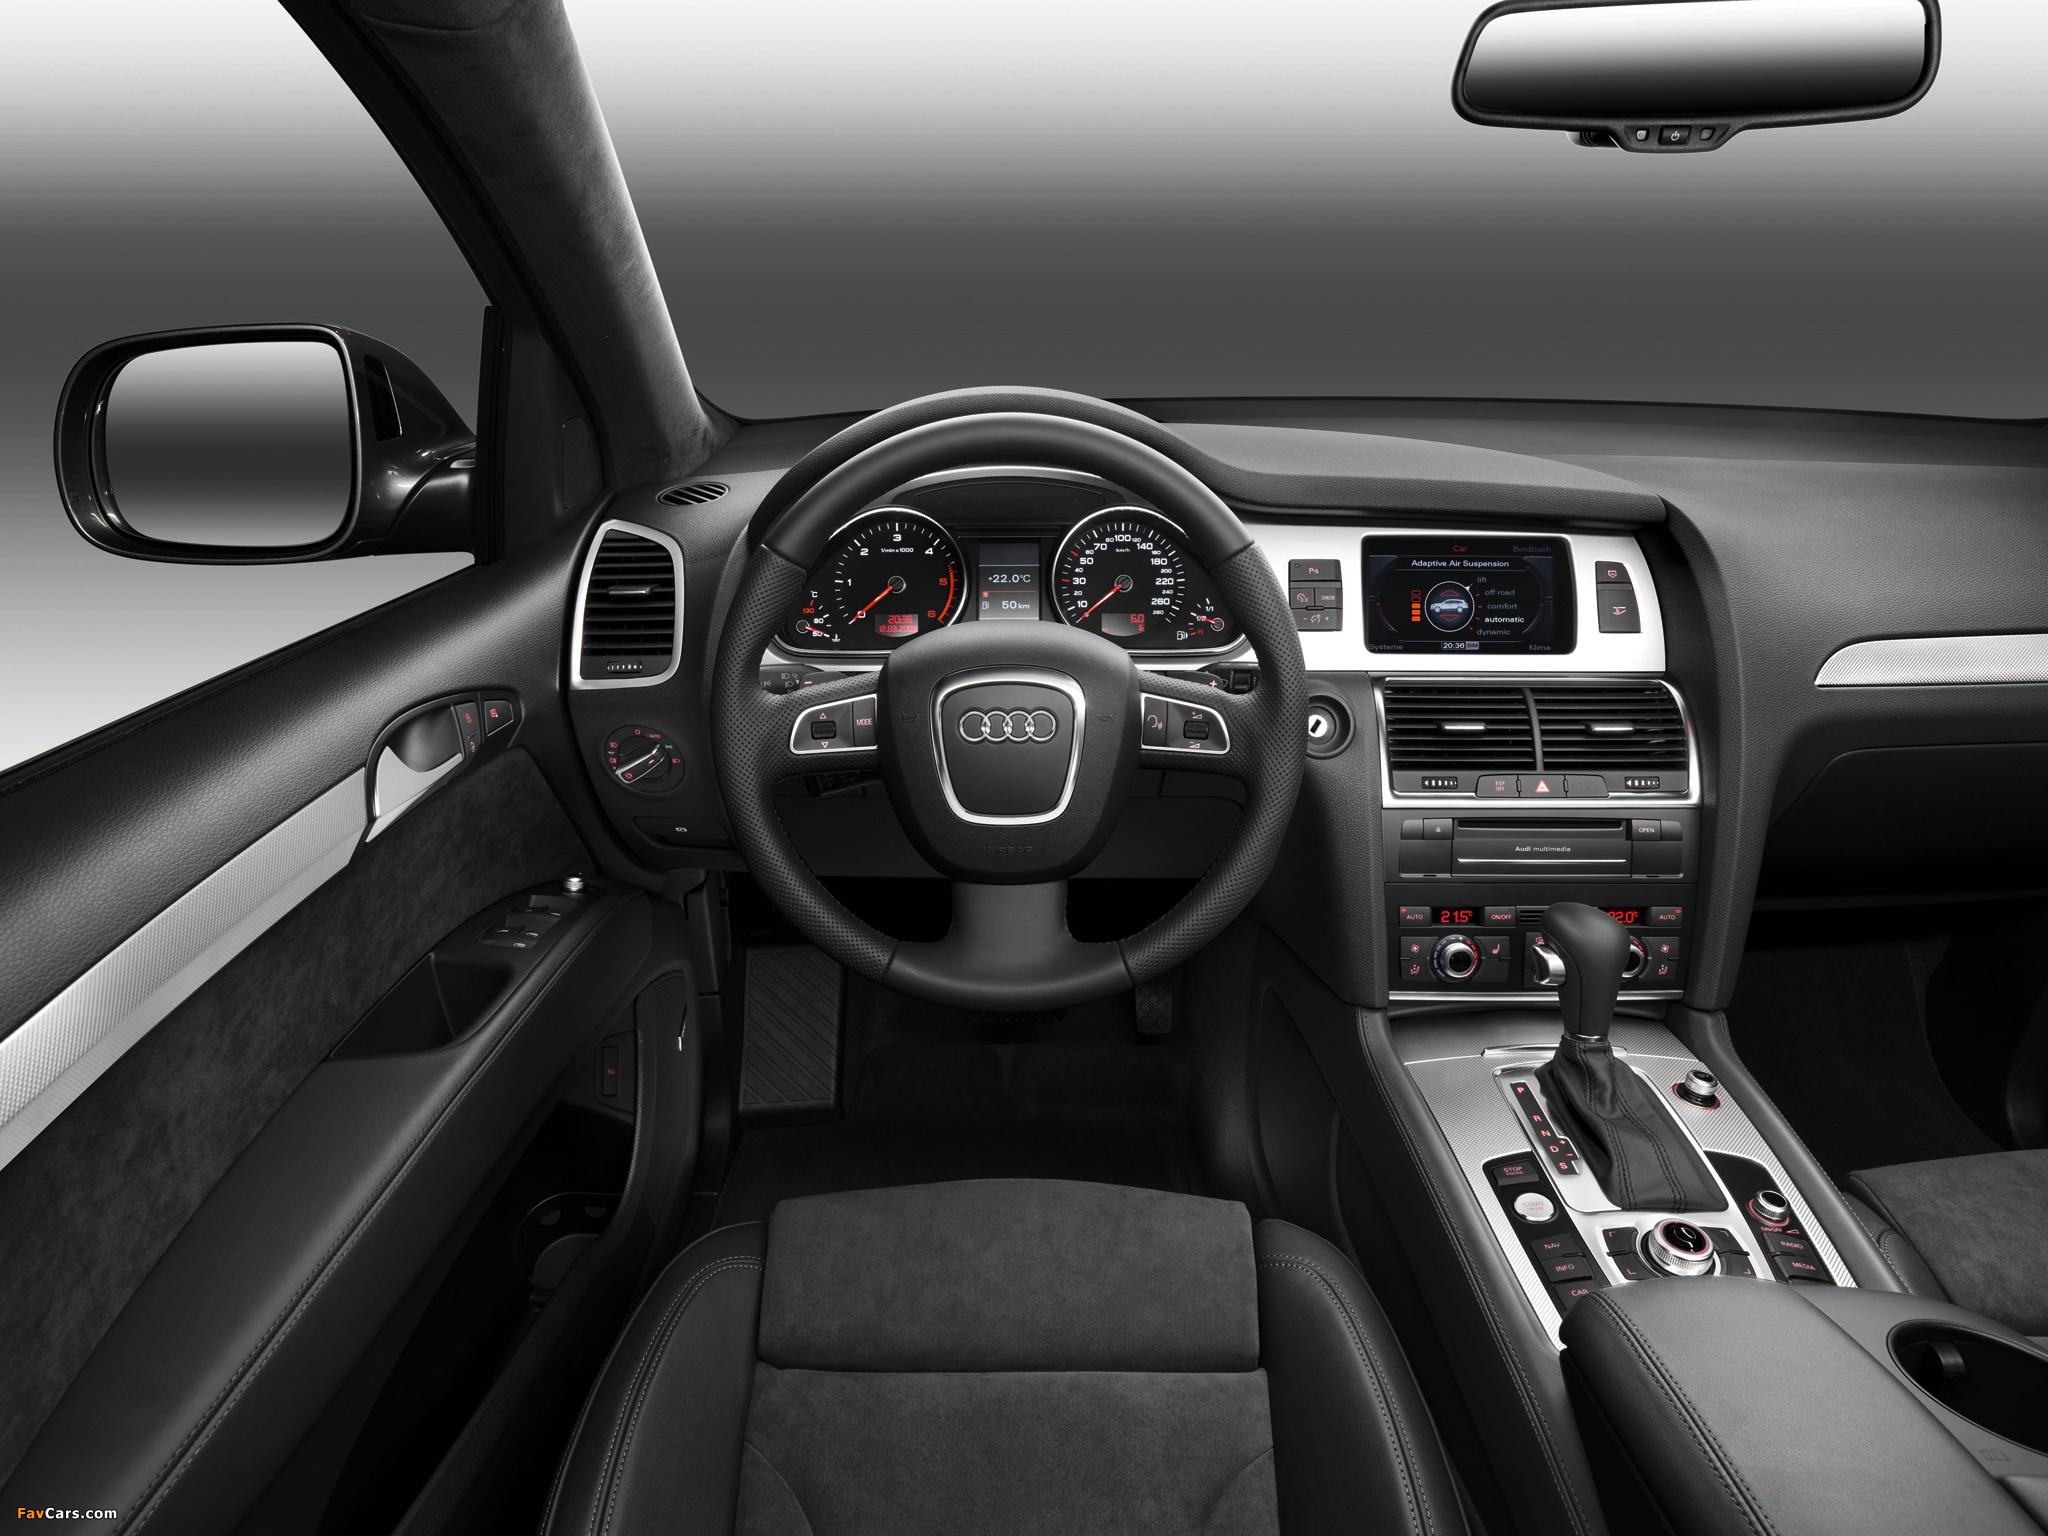 Kelebihan Kekurangan Audi Q7 4.2 Tdi Murah Berkualitas